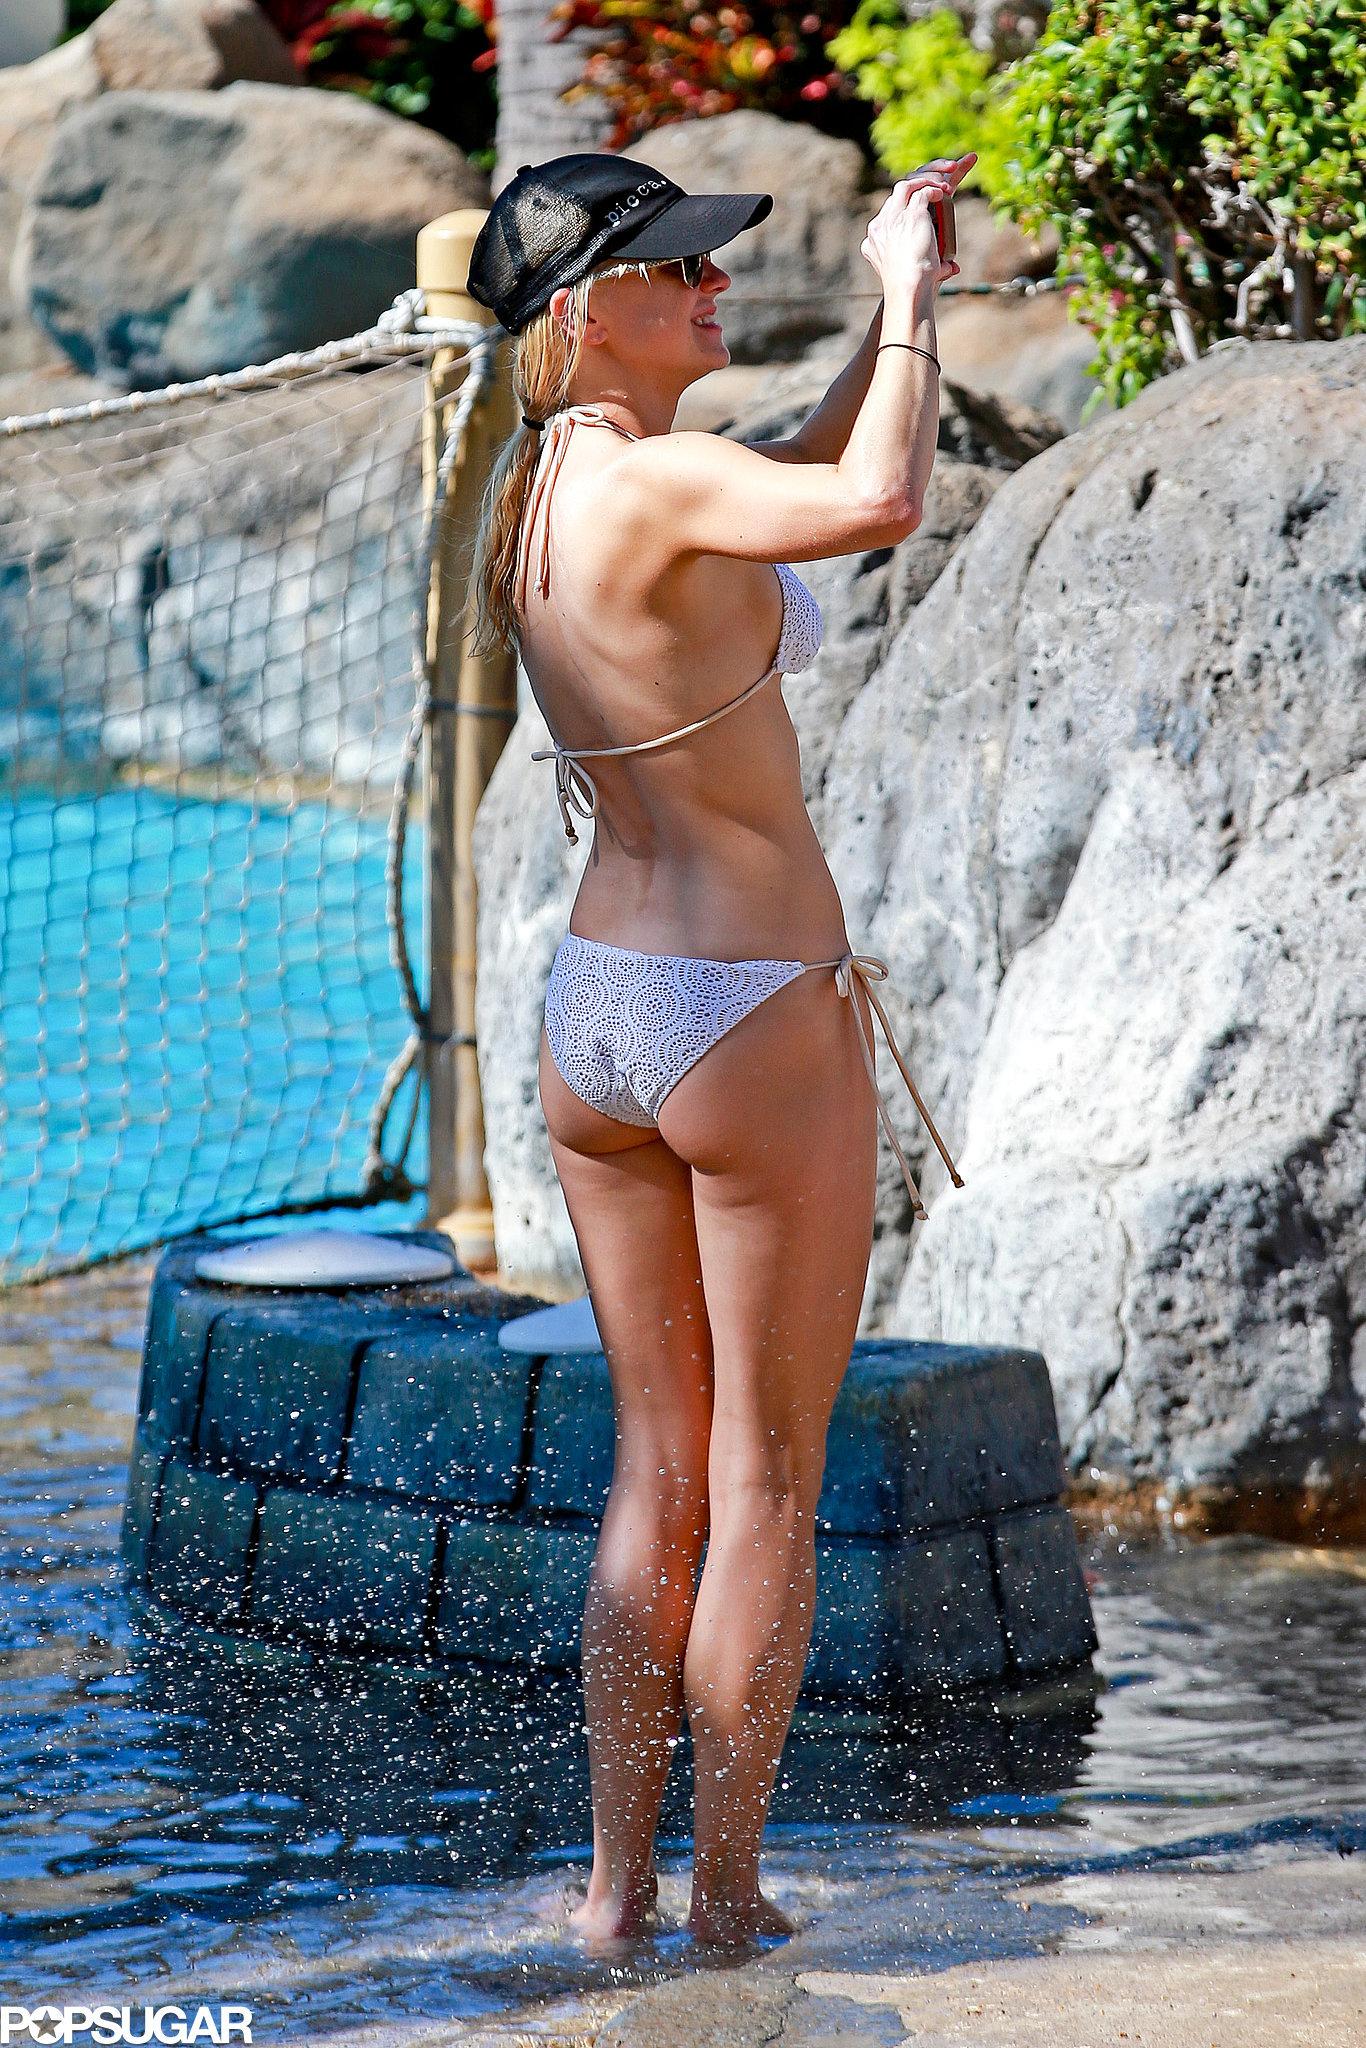 ... Anna Faris's Beach Bodies Are Out of This World | POPSUGAR Celebrity: www.popsugar.com/celebrity/photo-gallery/36198589/image/36198604...